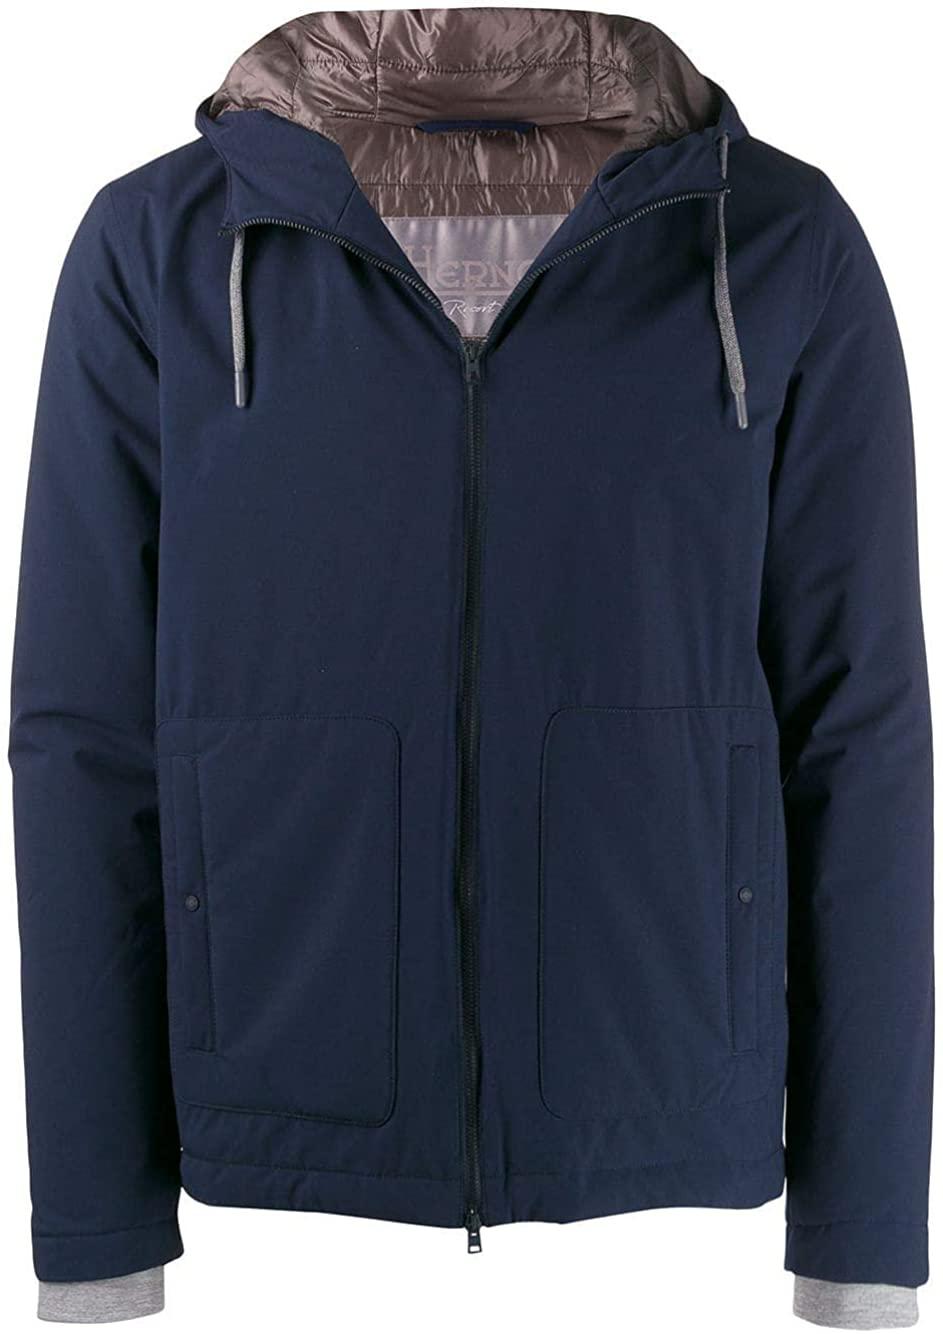 Herno Luxury Fashion Man GI004UR122549209 Blue Polyamide Outerwear Jacket   Fall Winter 19